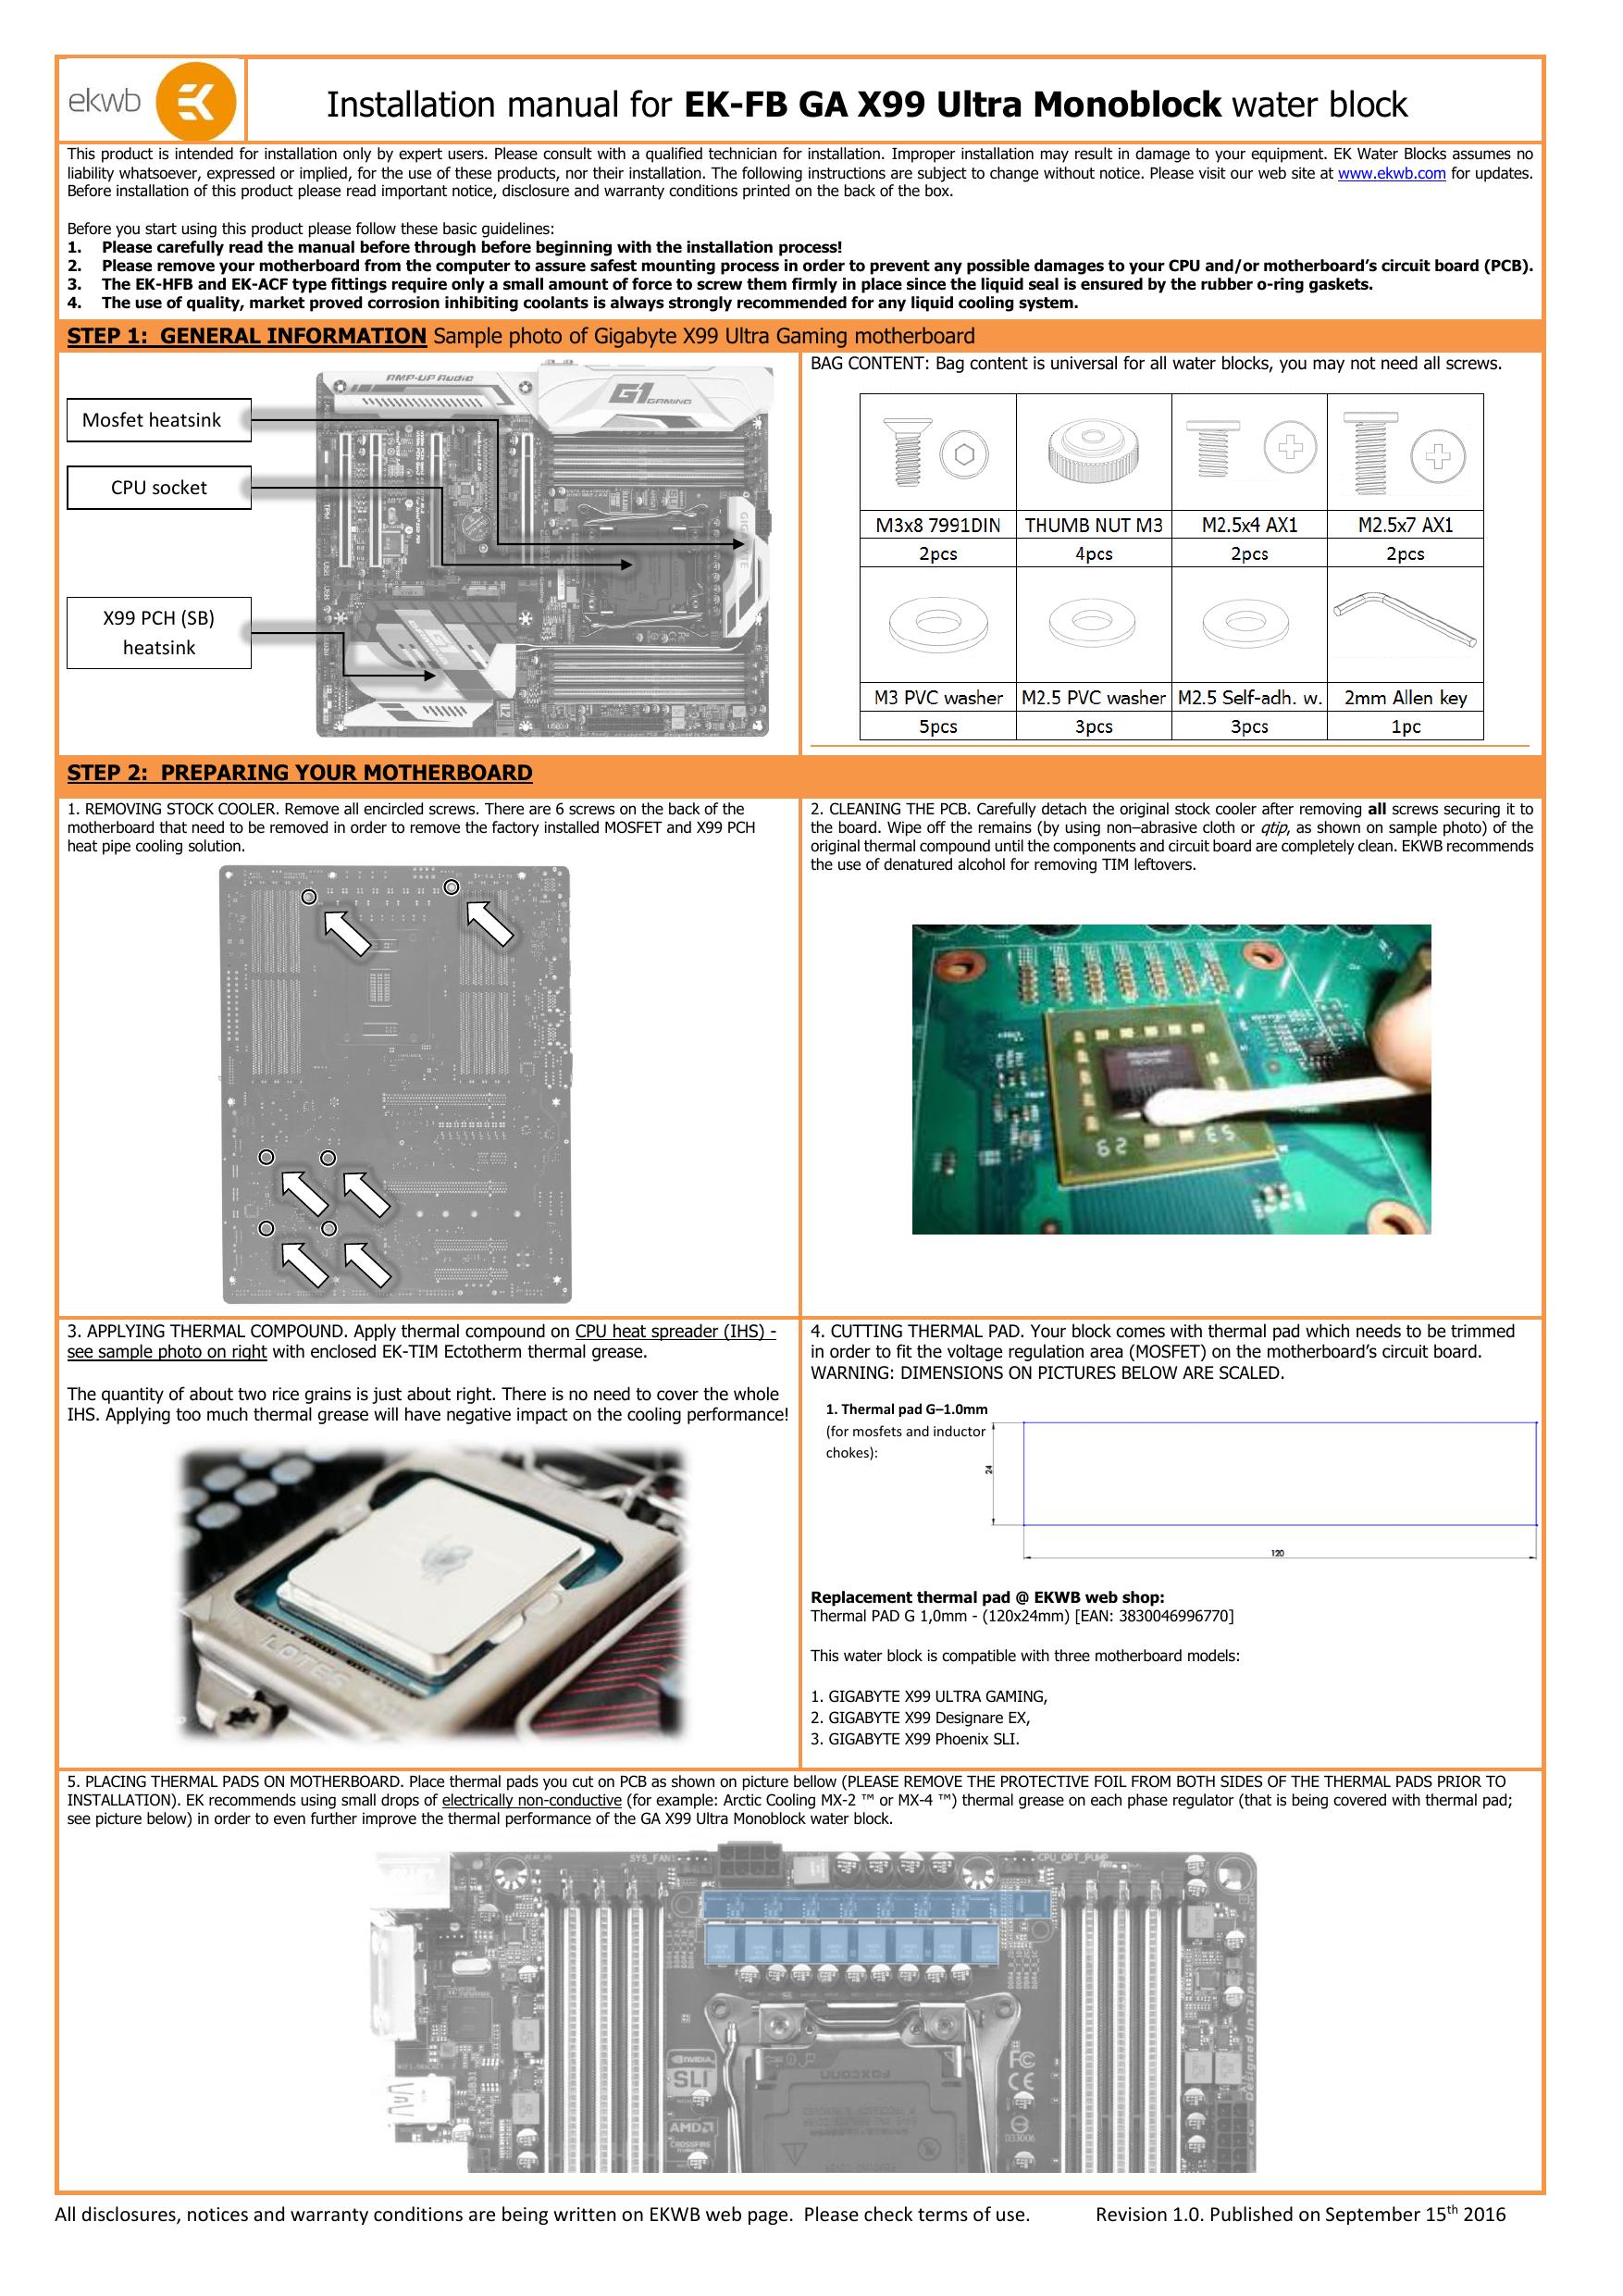 Installation manual for EK-FB GA X99 Ultra Monoblock | manualzz com